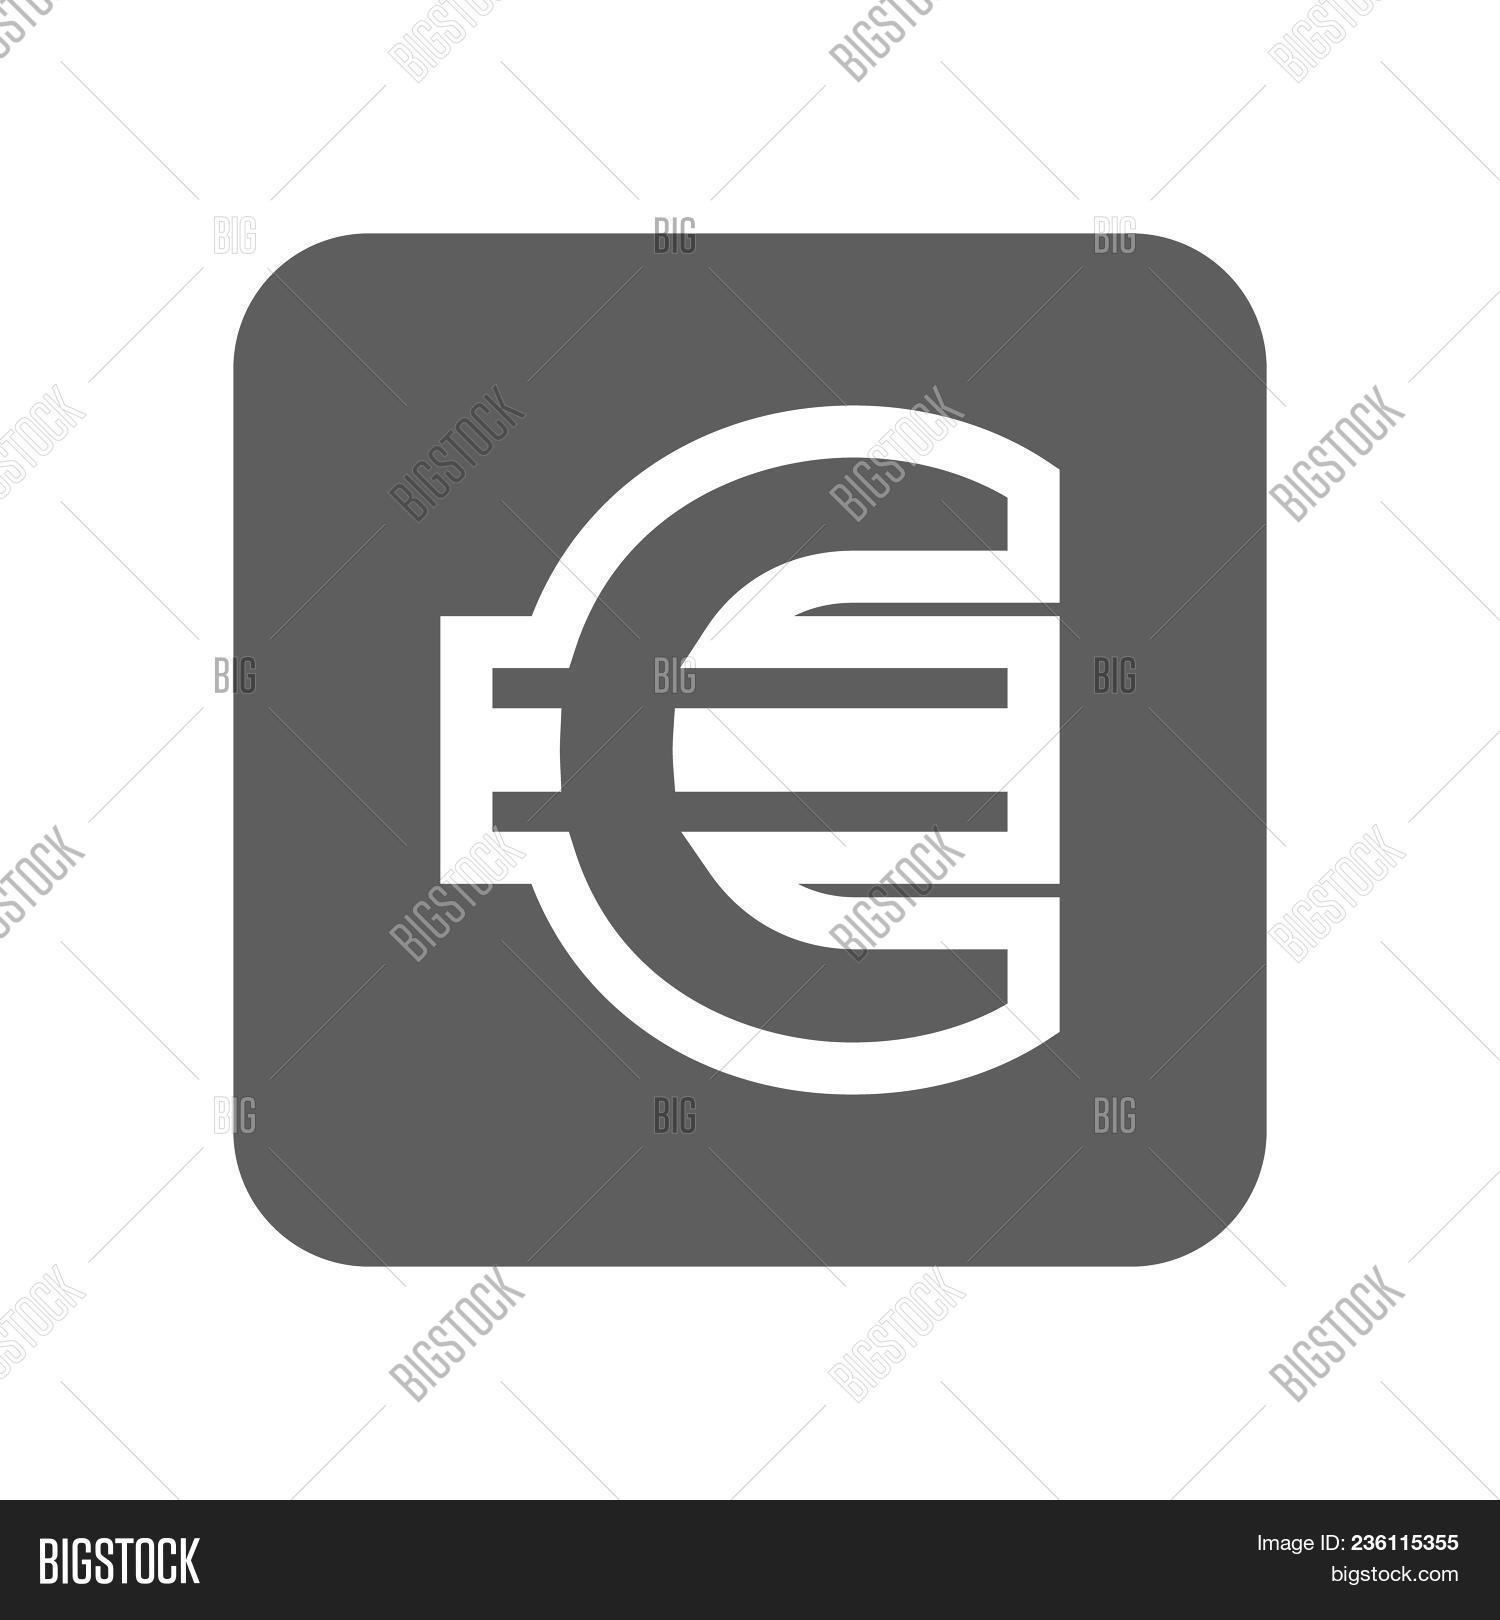 Eu Euro Currency Image Photo Free Trial Bigstock